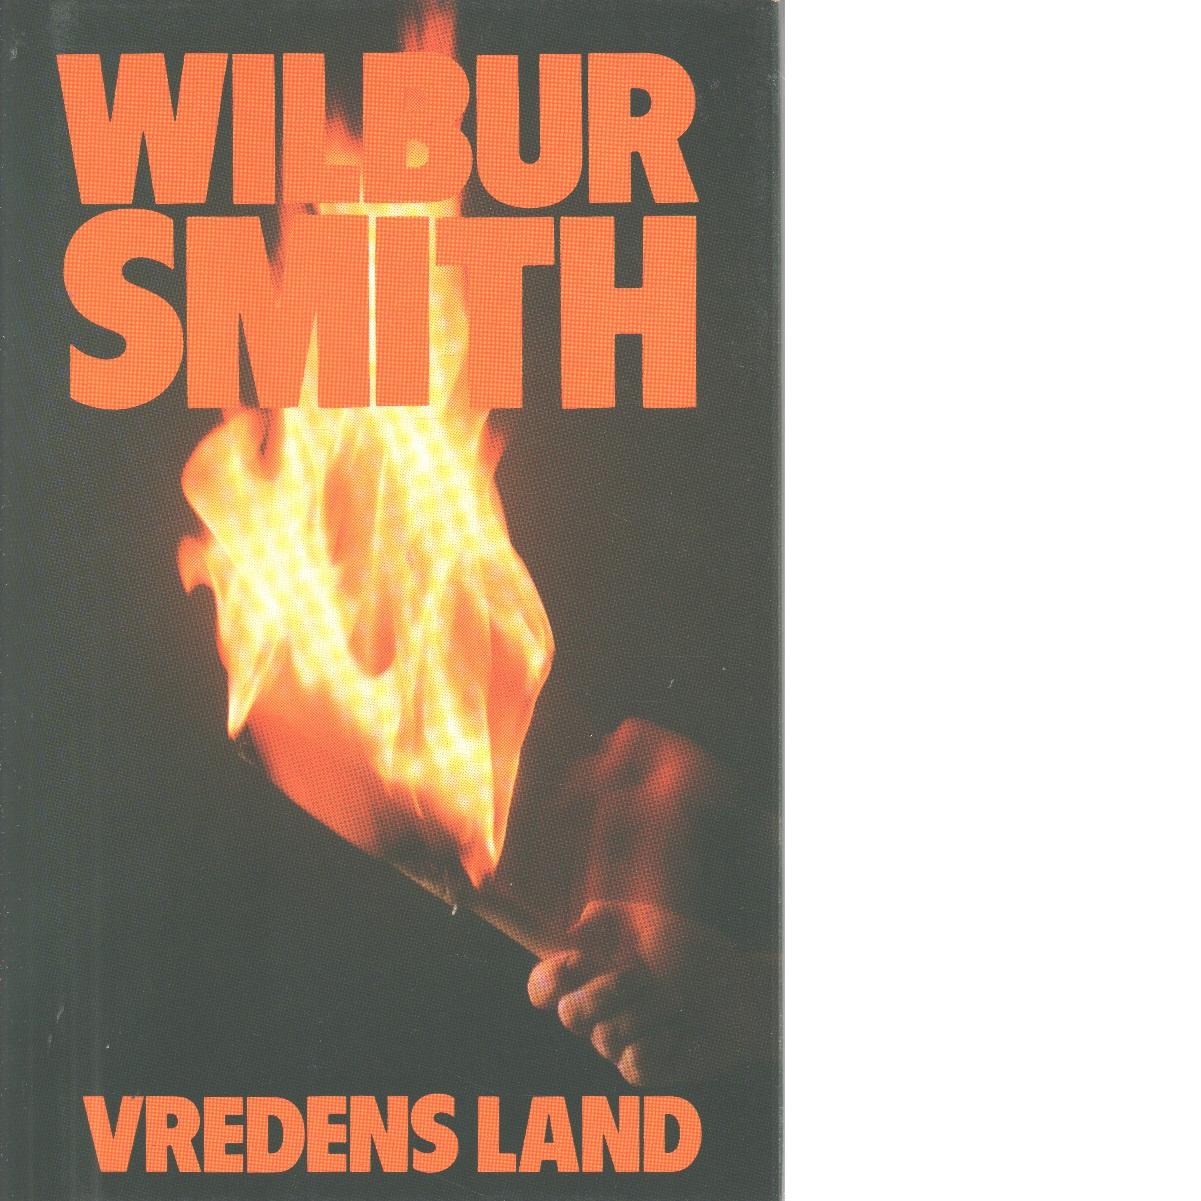 Vredens land - Smith, Wilbur